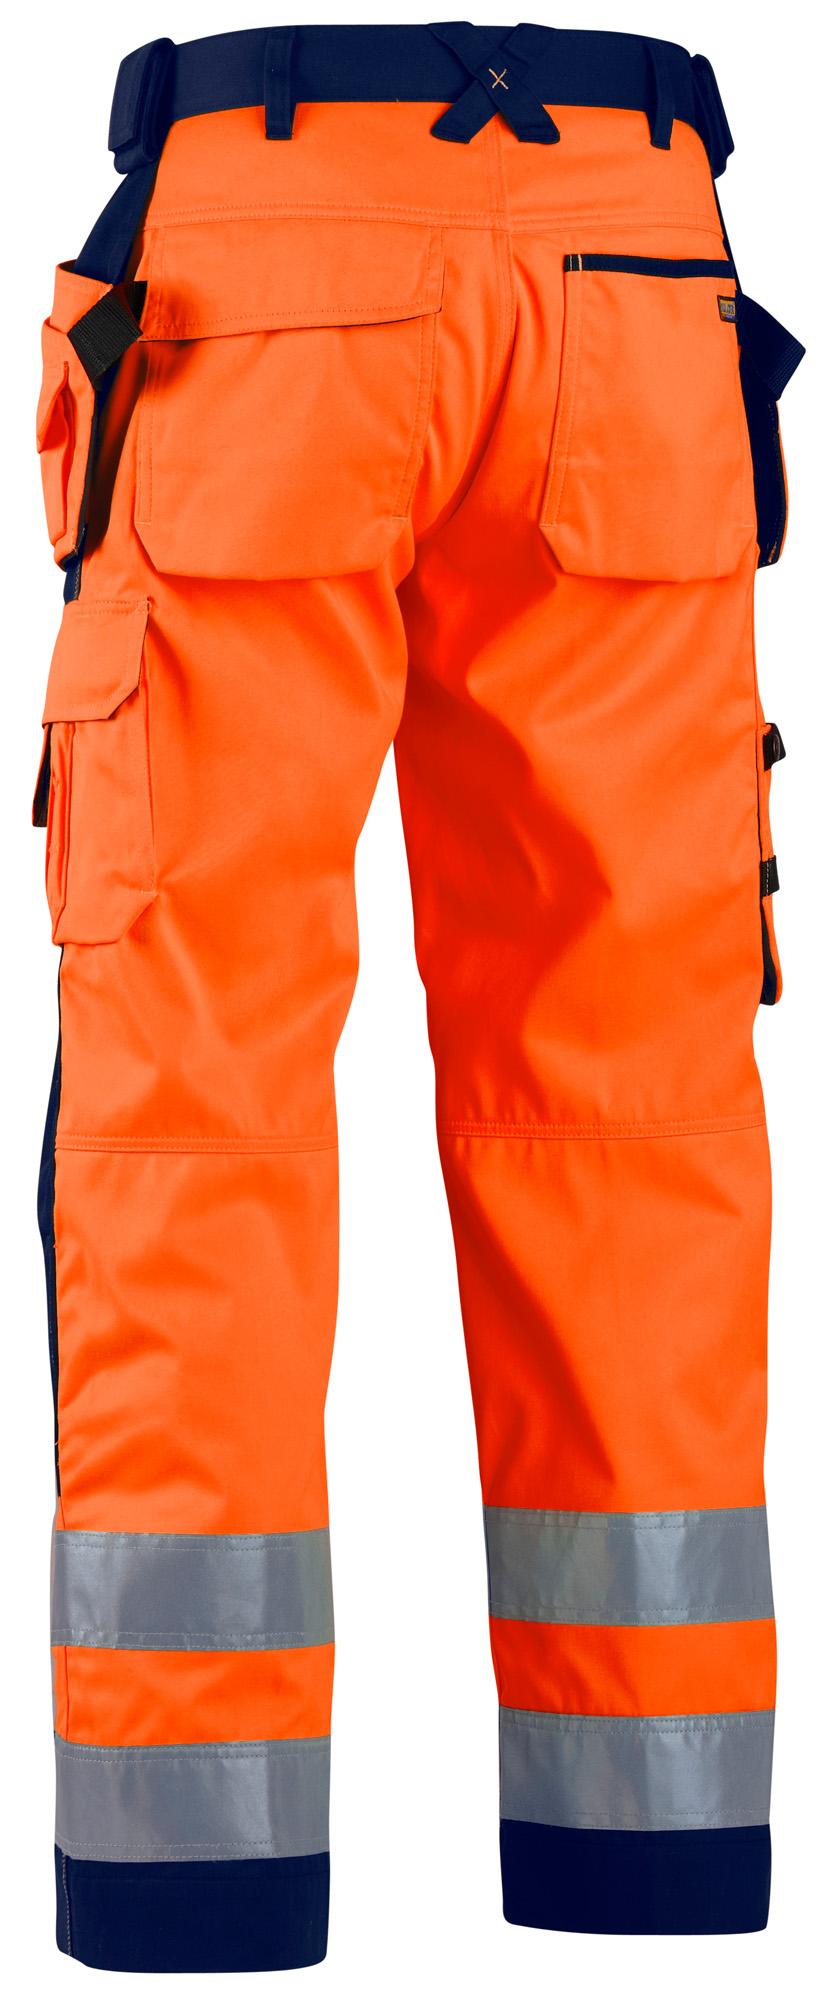 BLAKLADER BLAKLADER BLAKLADER Hi Vis Pantaloni Idrorepellente Knee & Nail tasche (Polycot) - 1568 696ef6